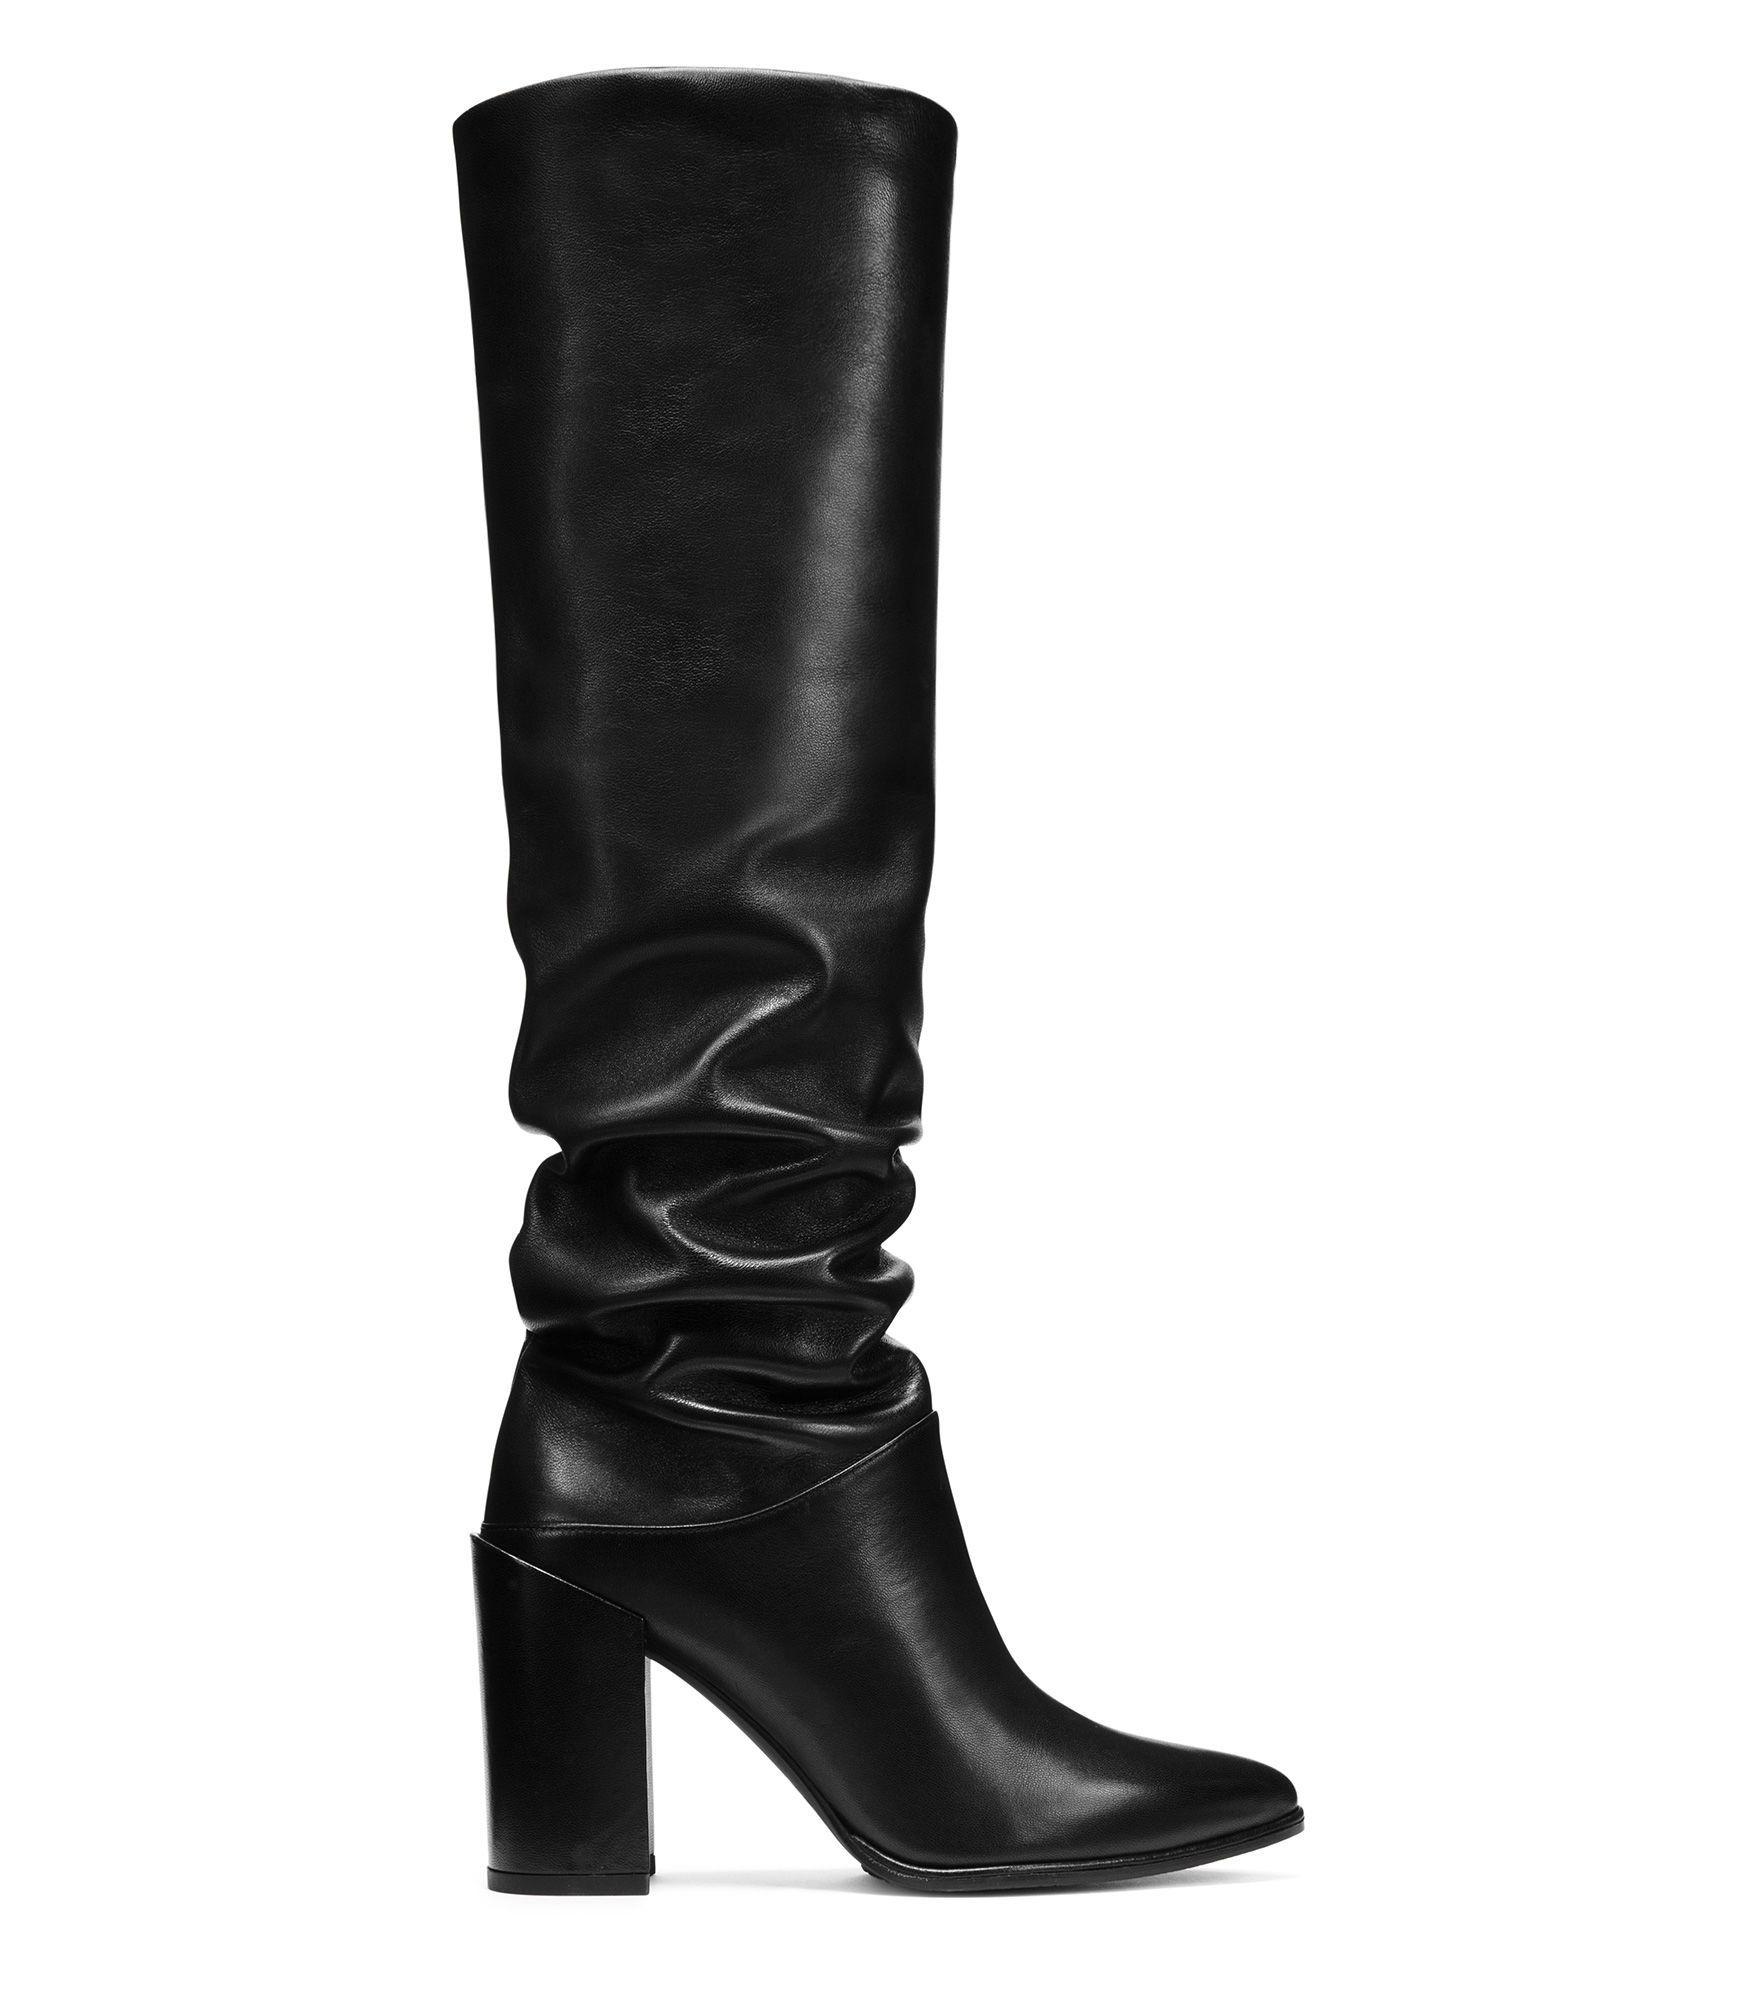 Stuart Weitzman Shoes, Scrunchy Nappa High Heel Boot